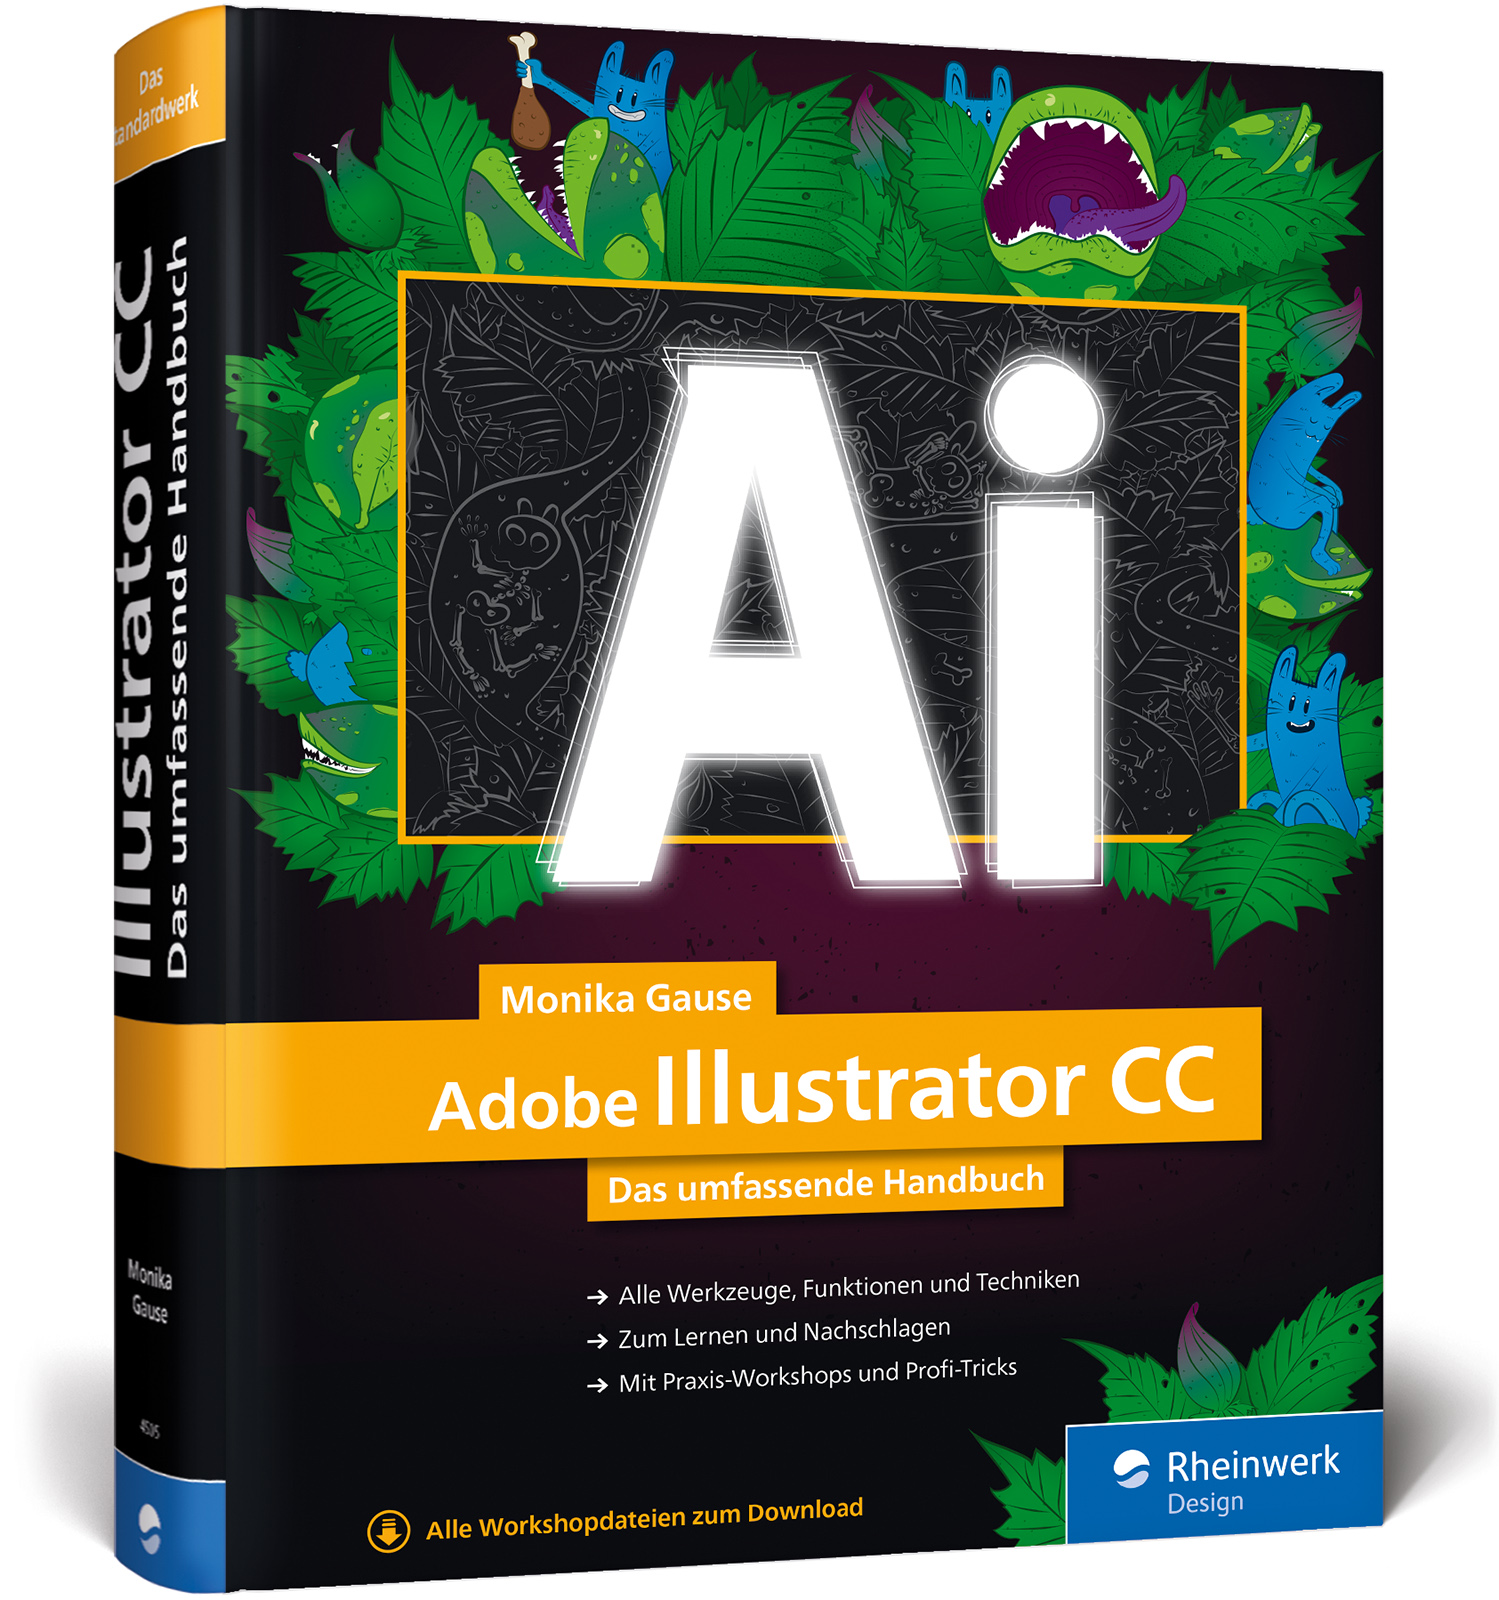 Adobe Illustrator CC Monika Gause